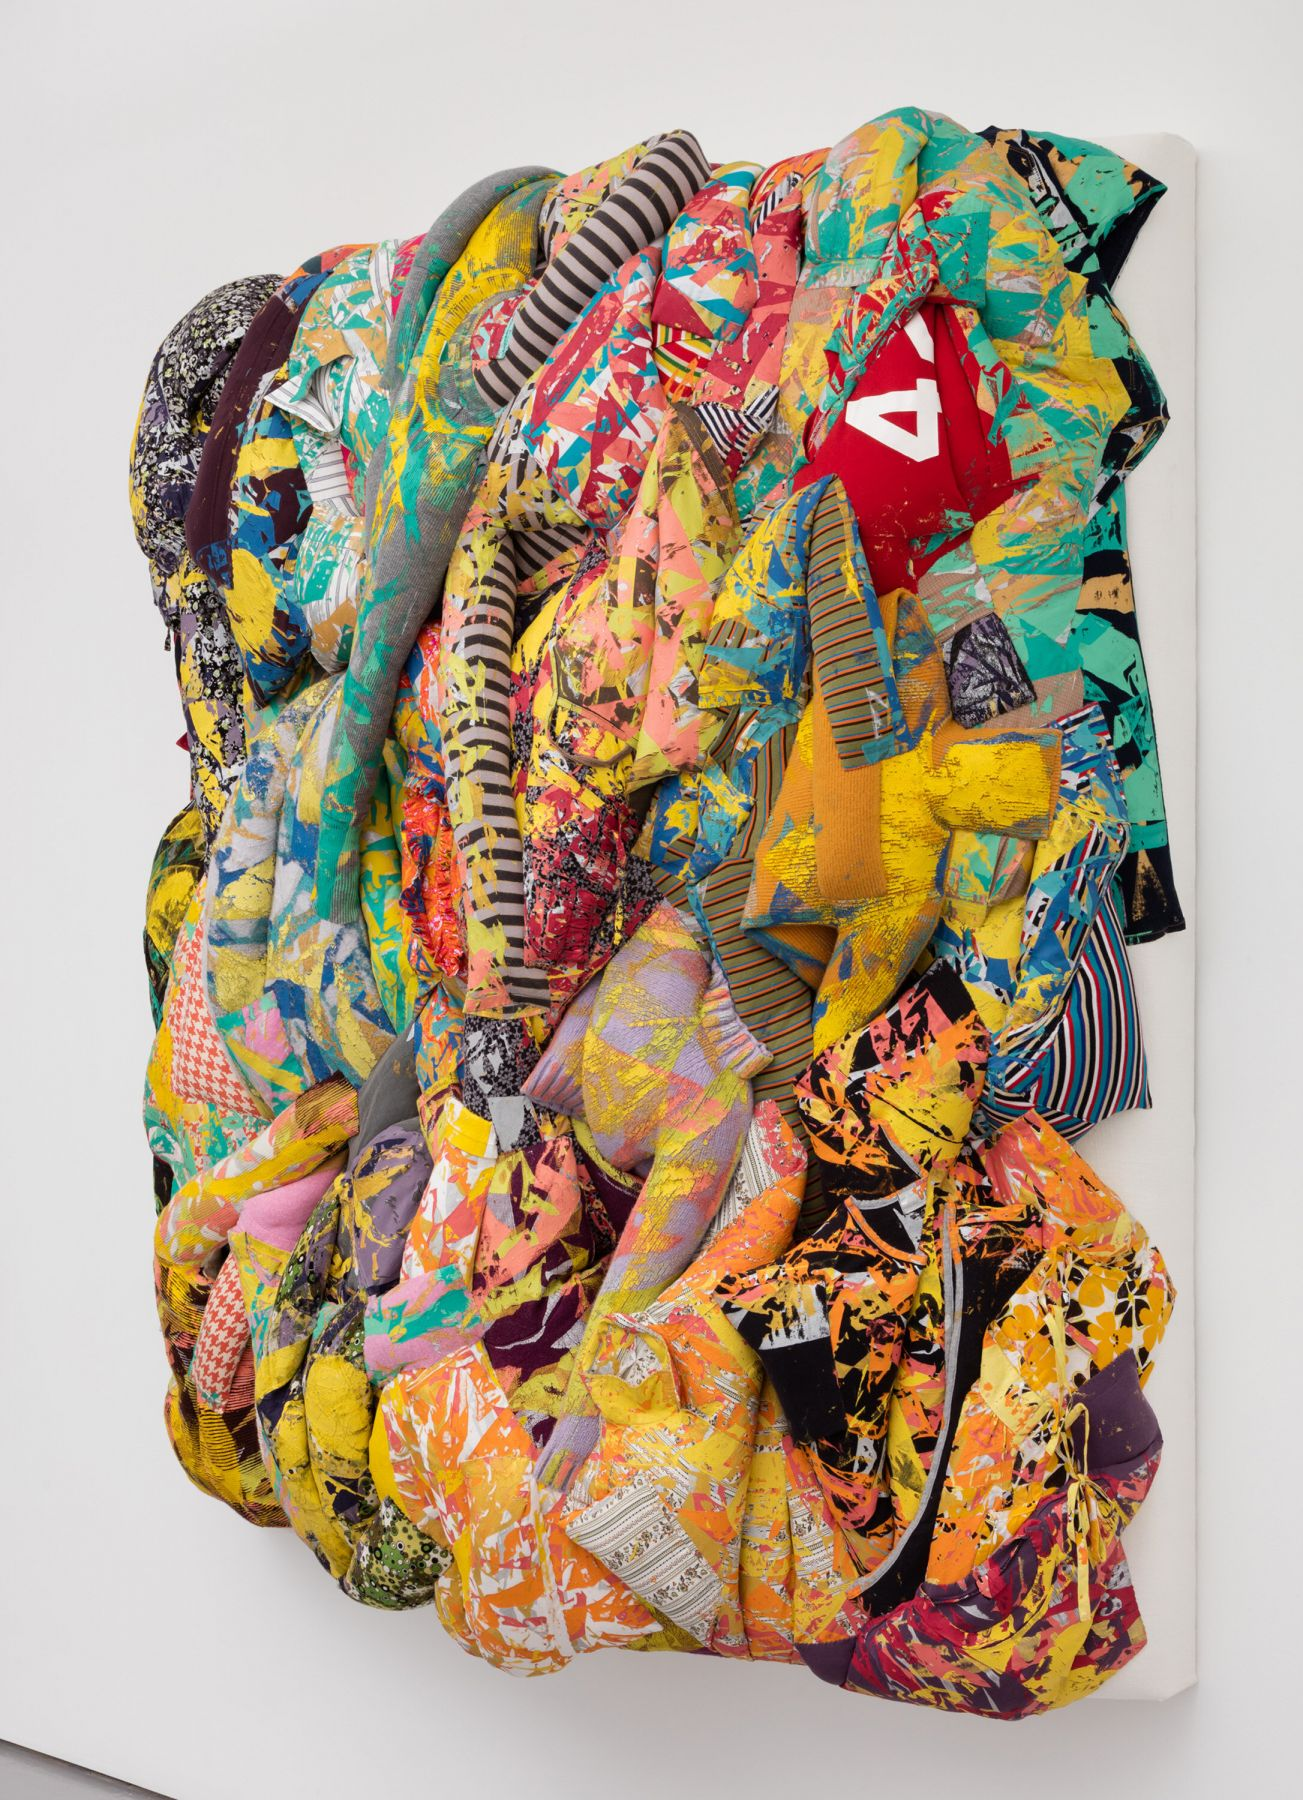 Aiko Hachisuka Untitled (Yellow) [side view], 2018